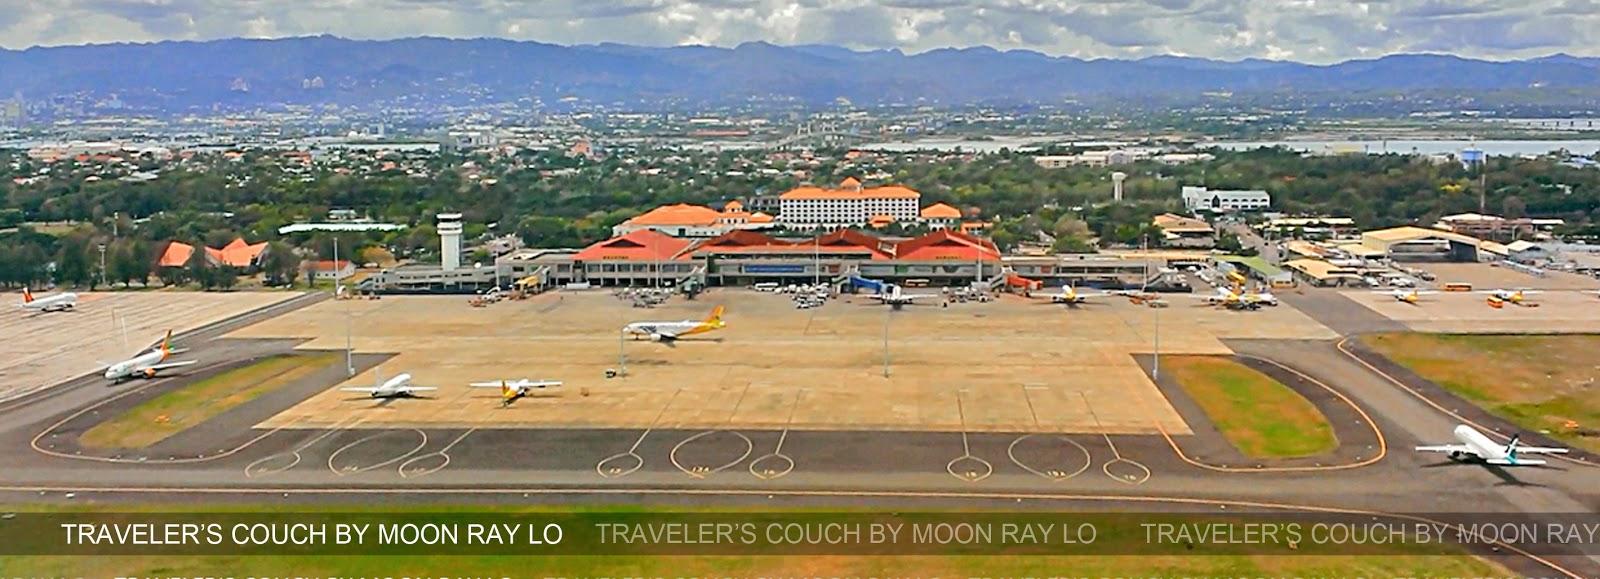 show nice views in cebu city philippines